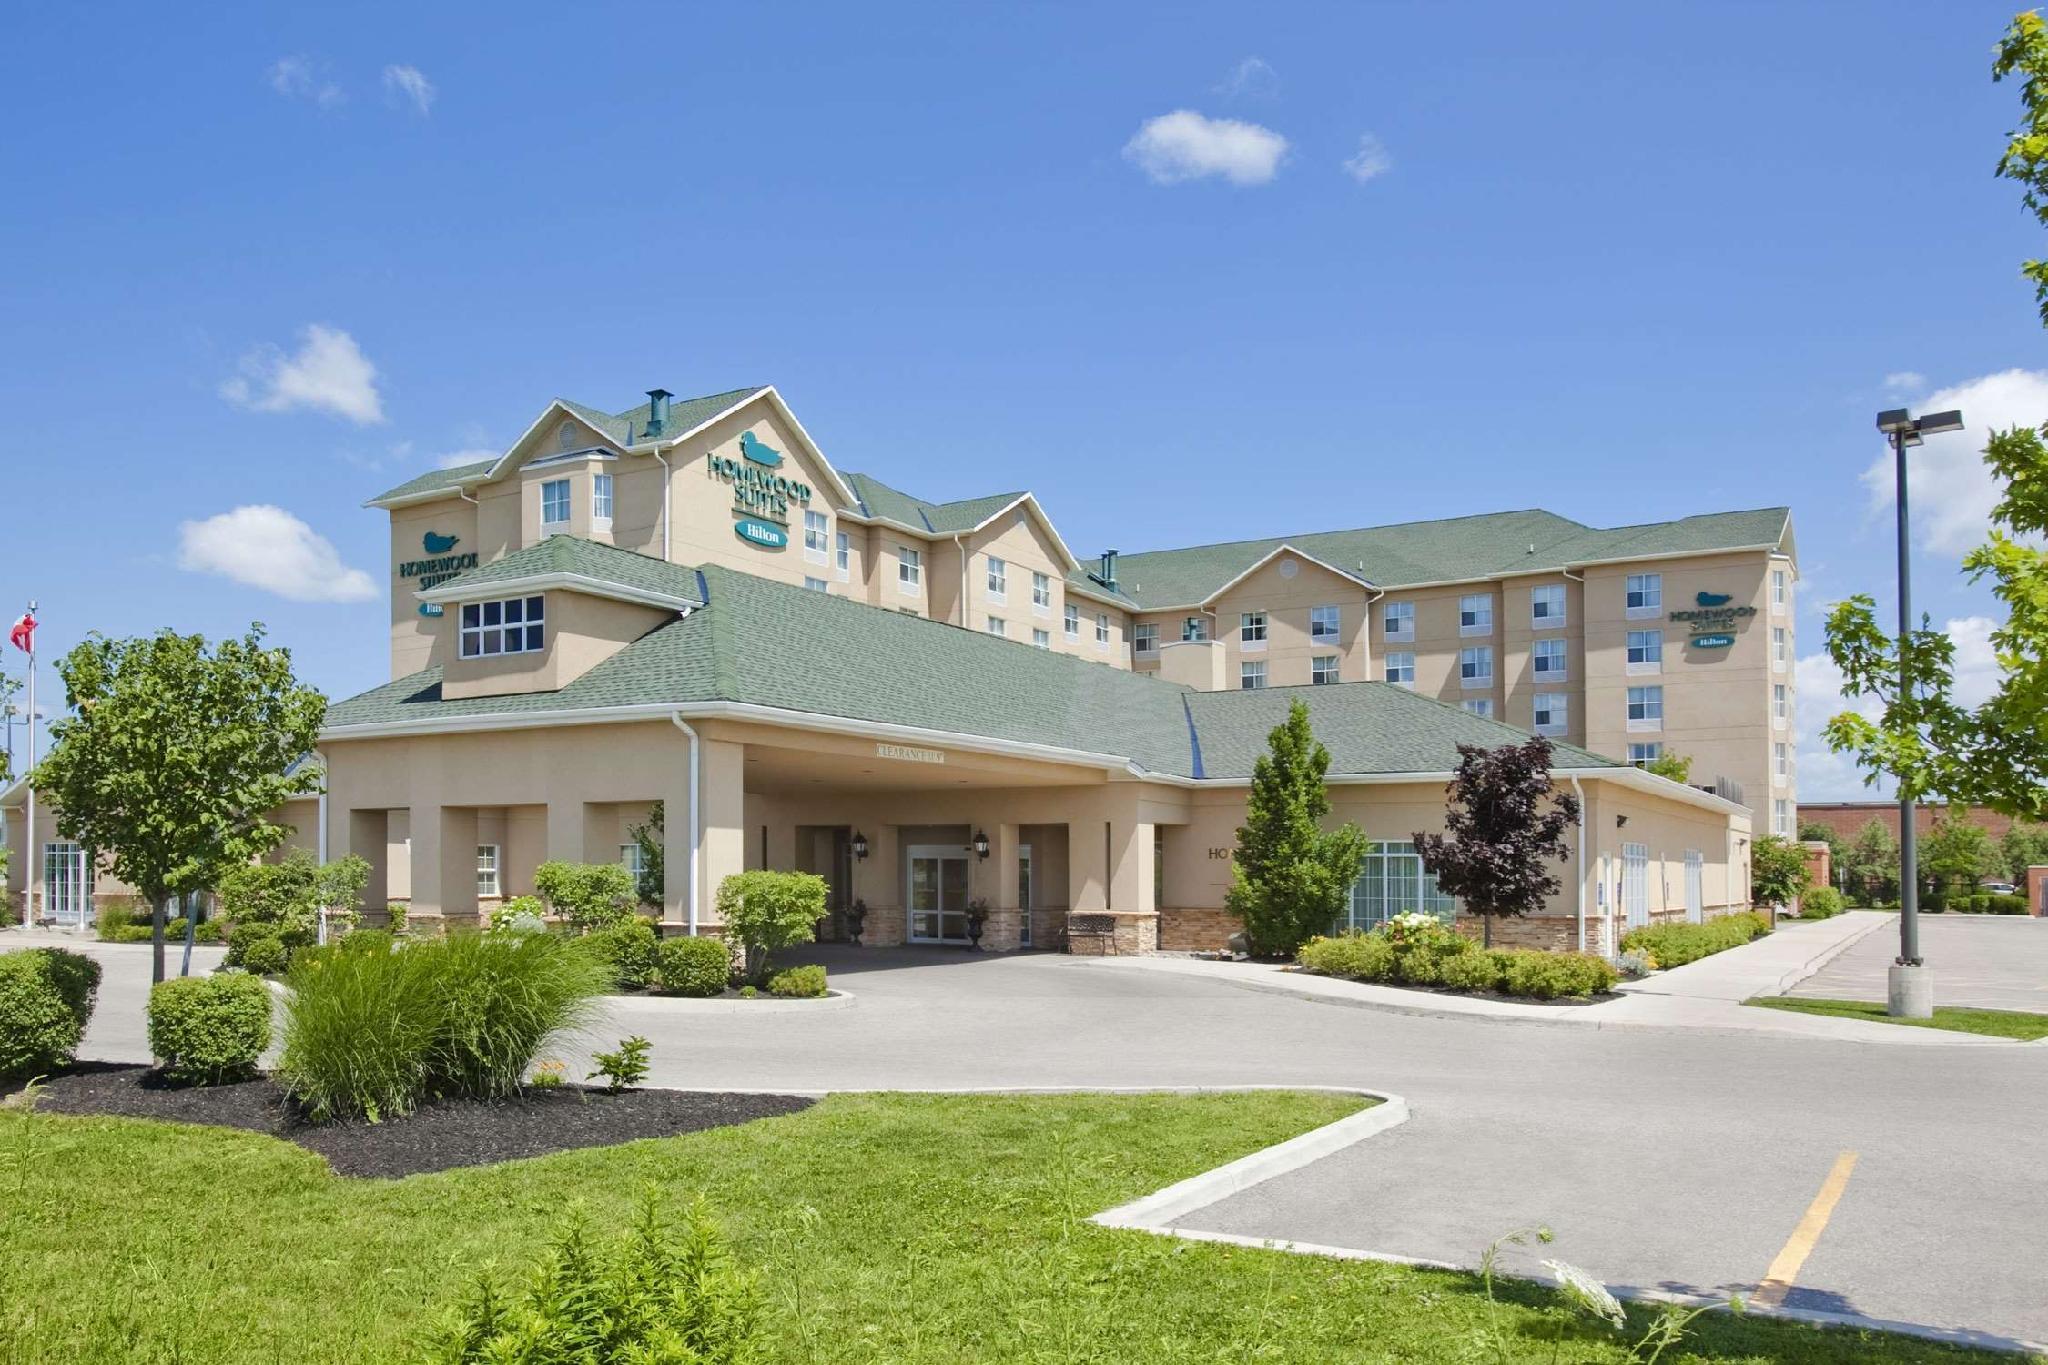 Homewood Suites By Hilton Cambridge Waterloo Ontario